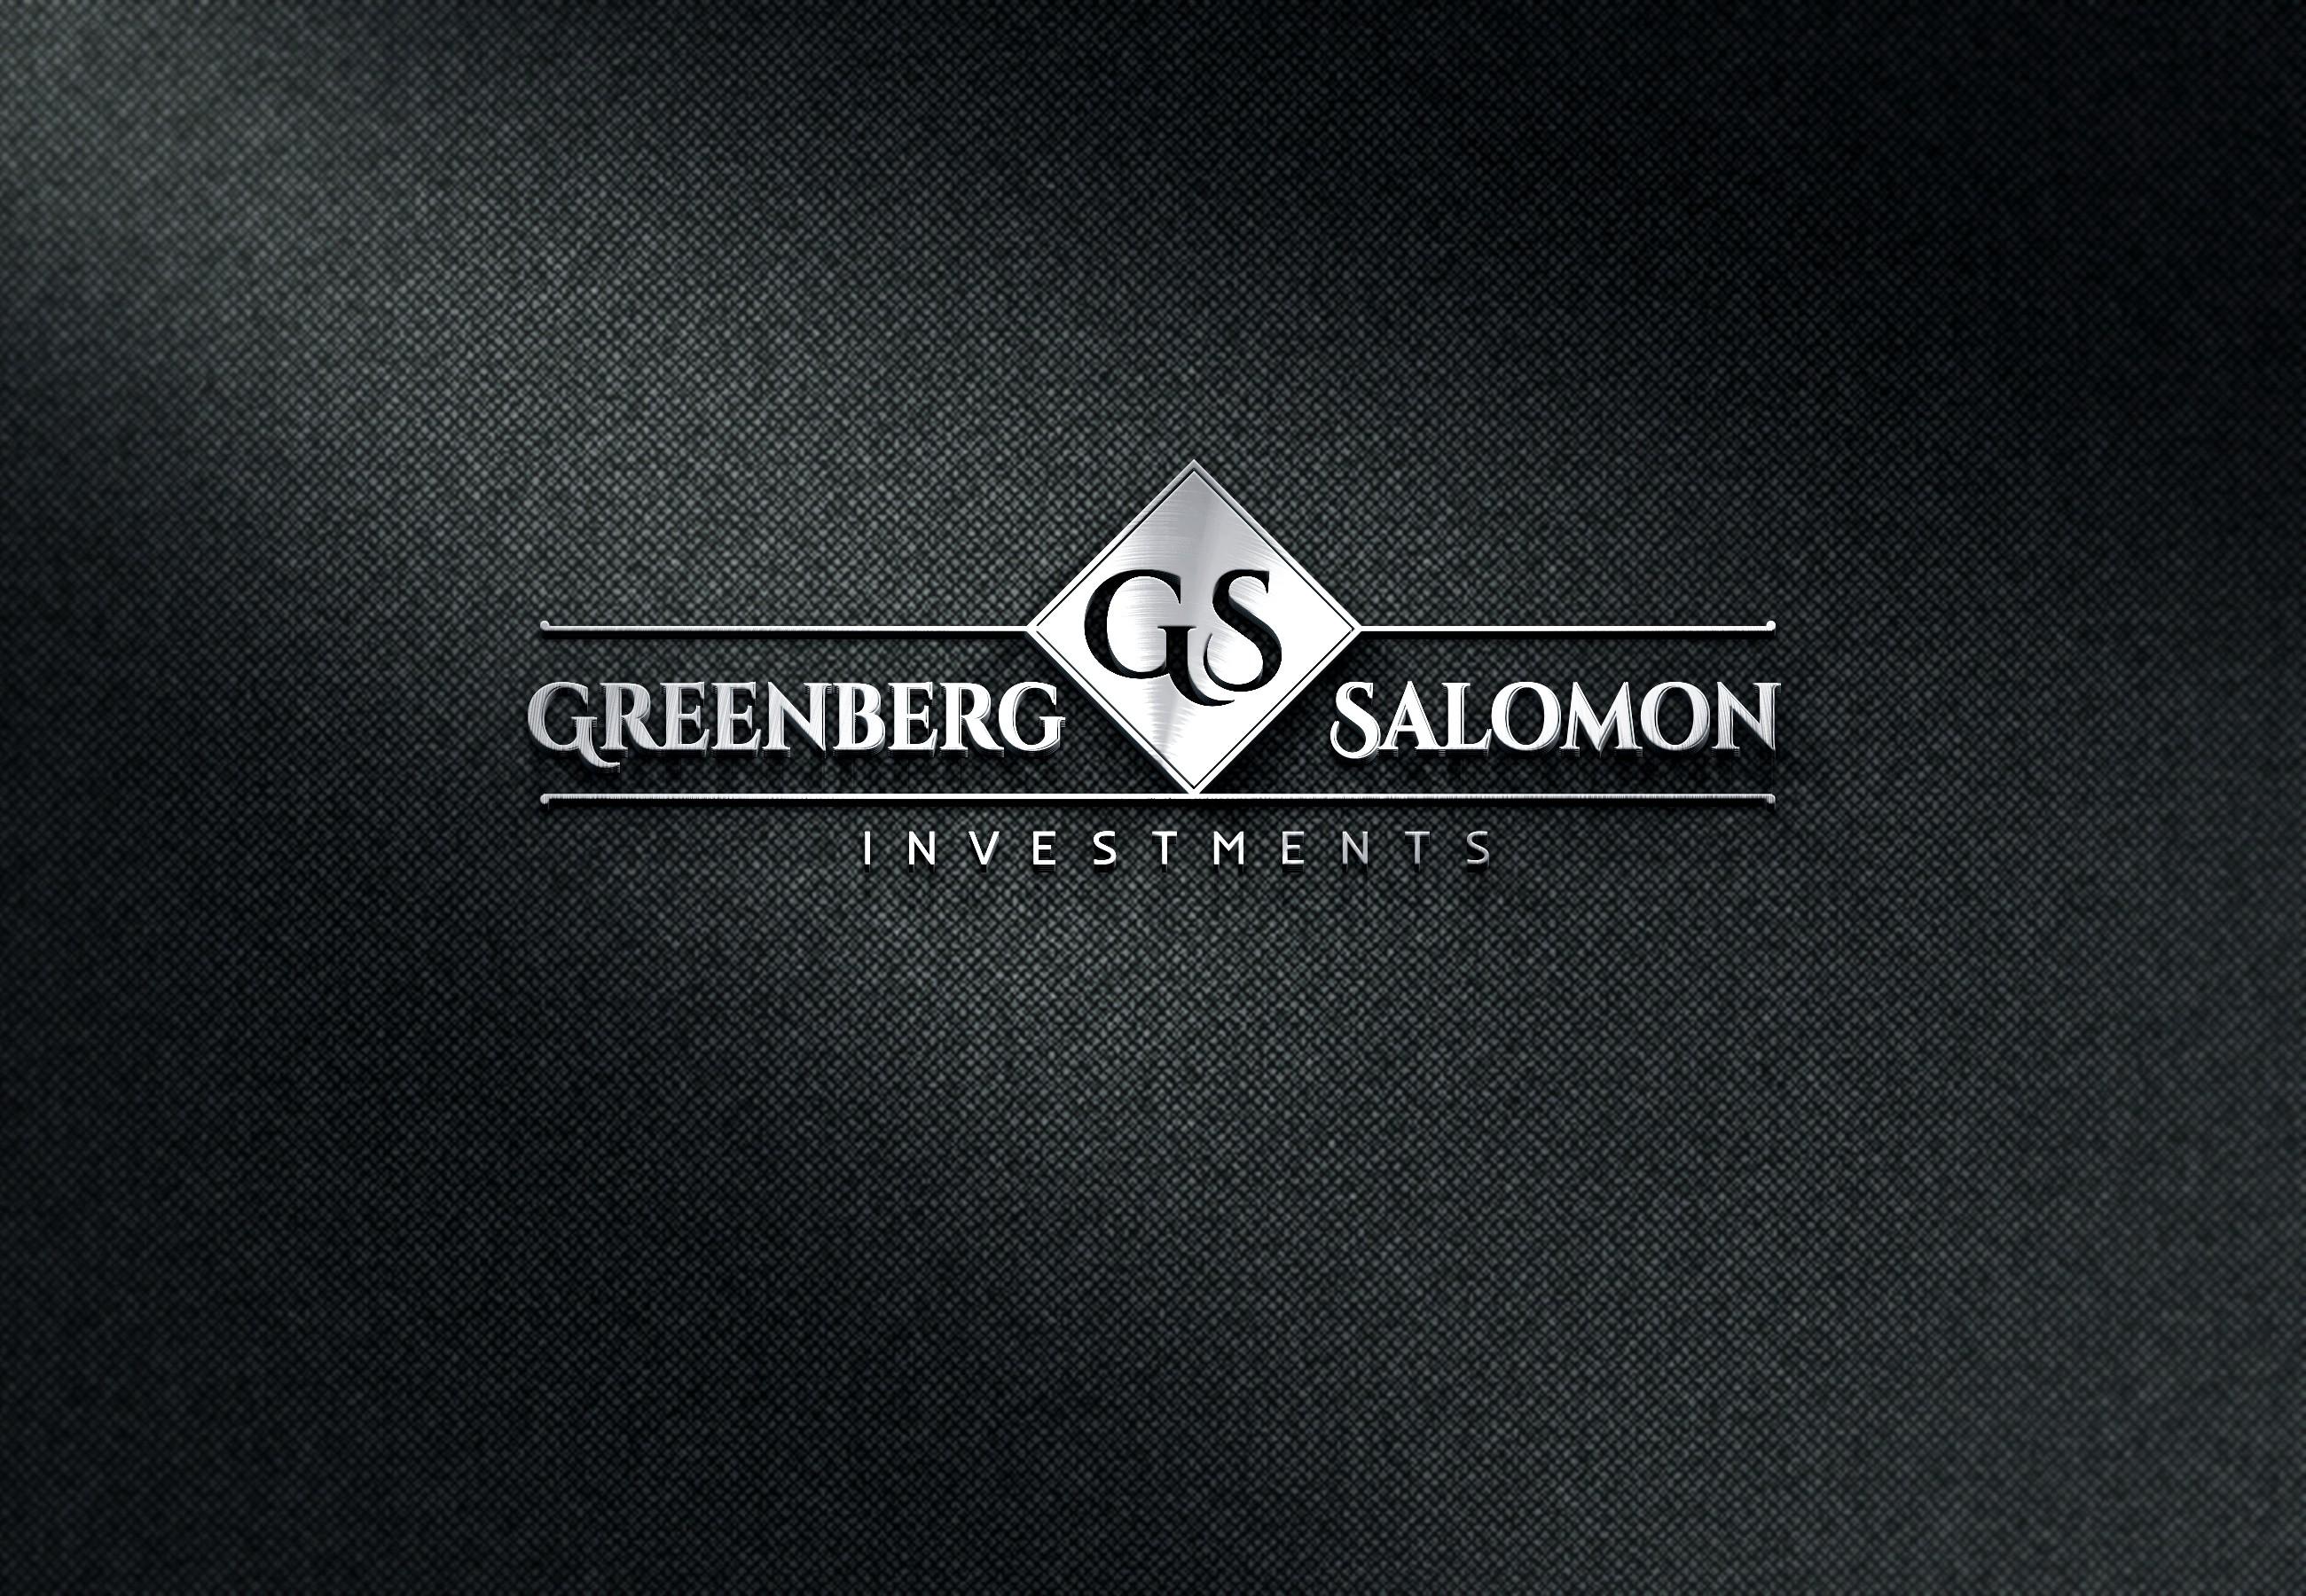 Logo for Greenberg & Salomon Investments LTD, G&S Investments